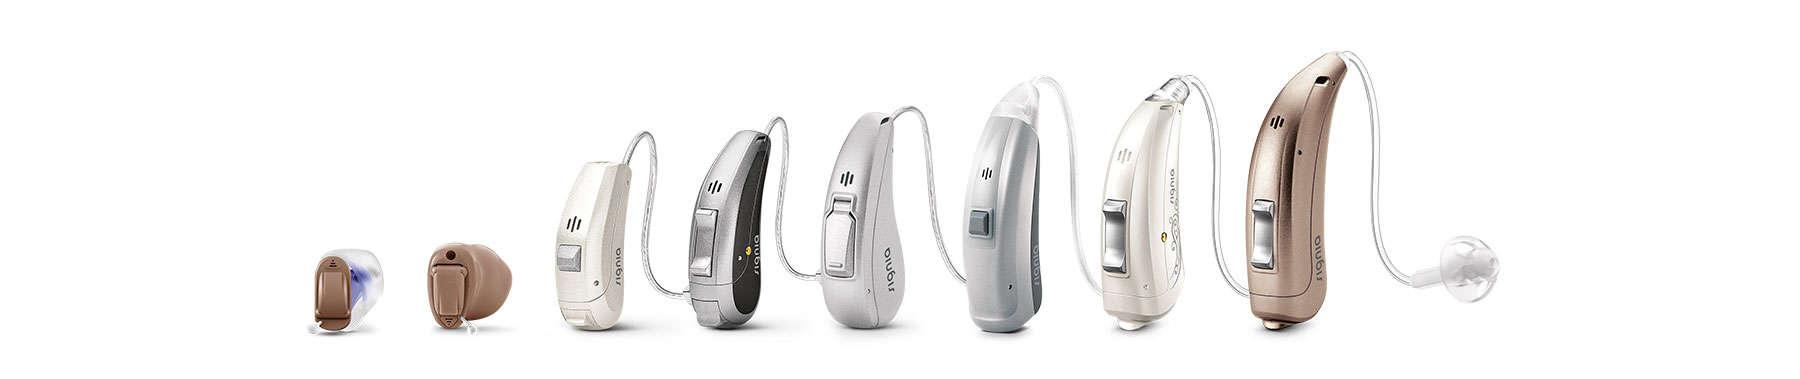 Tinnitus_product-range_1800x380px